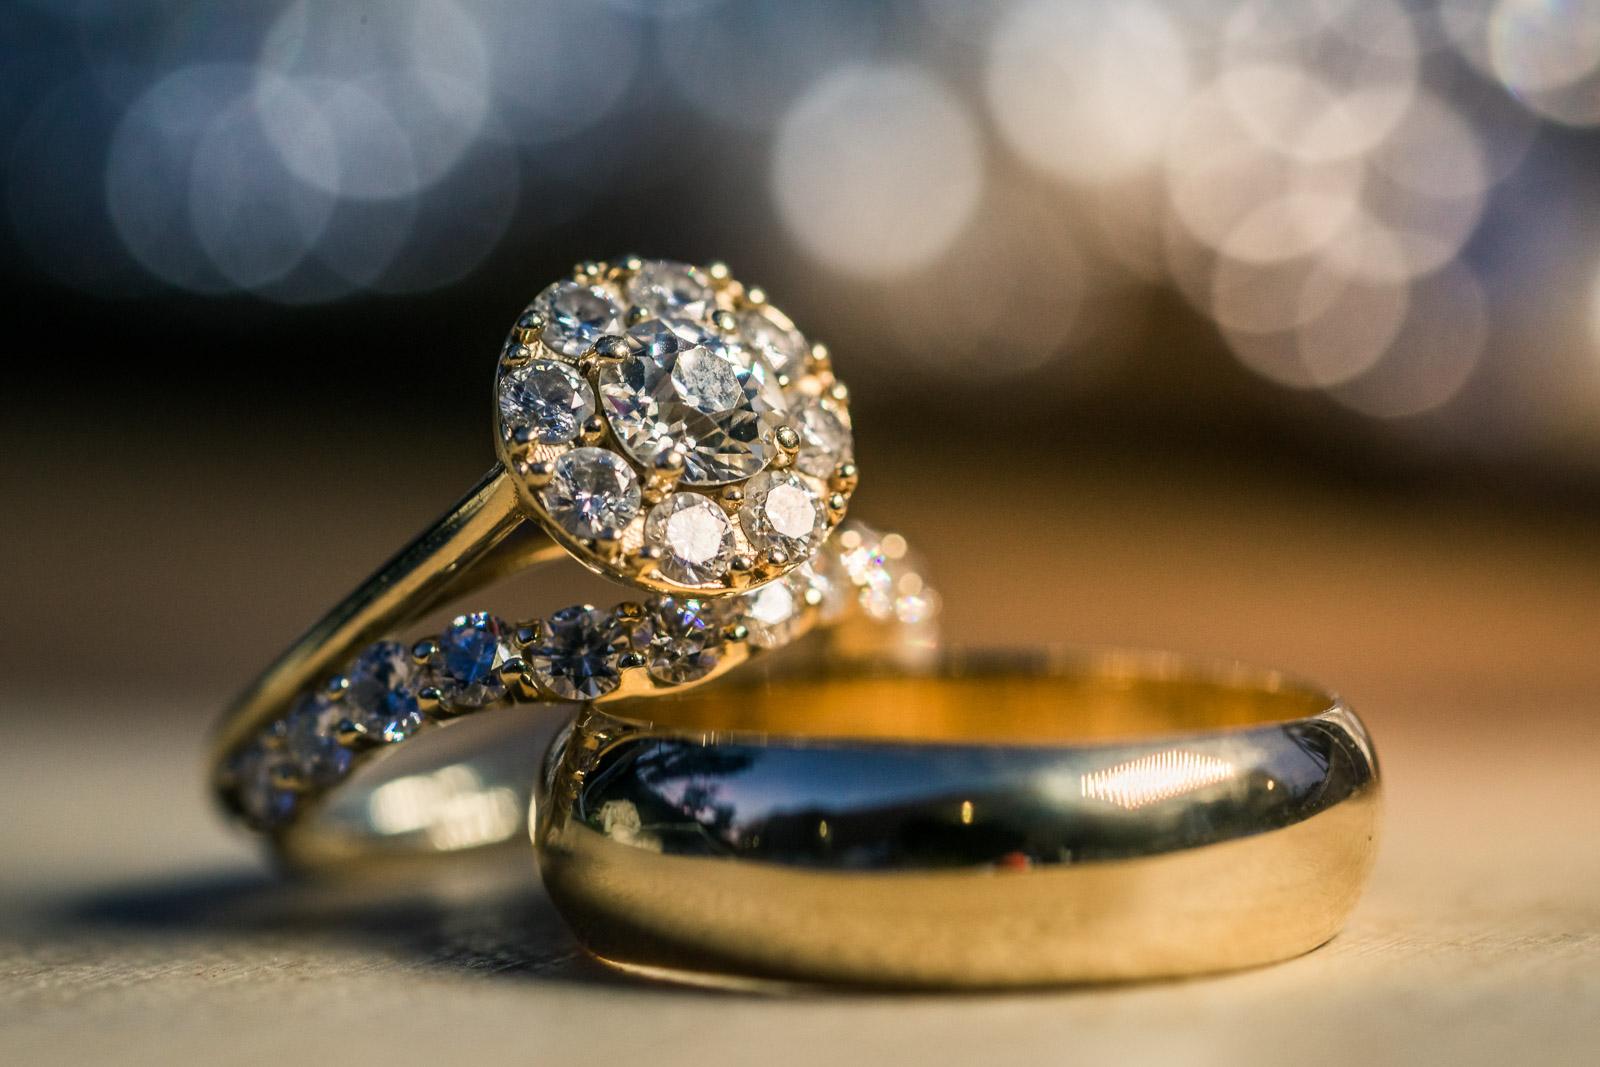 370_Angel-Brea-Orange-County_Joseph-Barber-Wedding-Photography.jpg